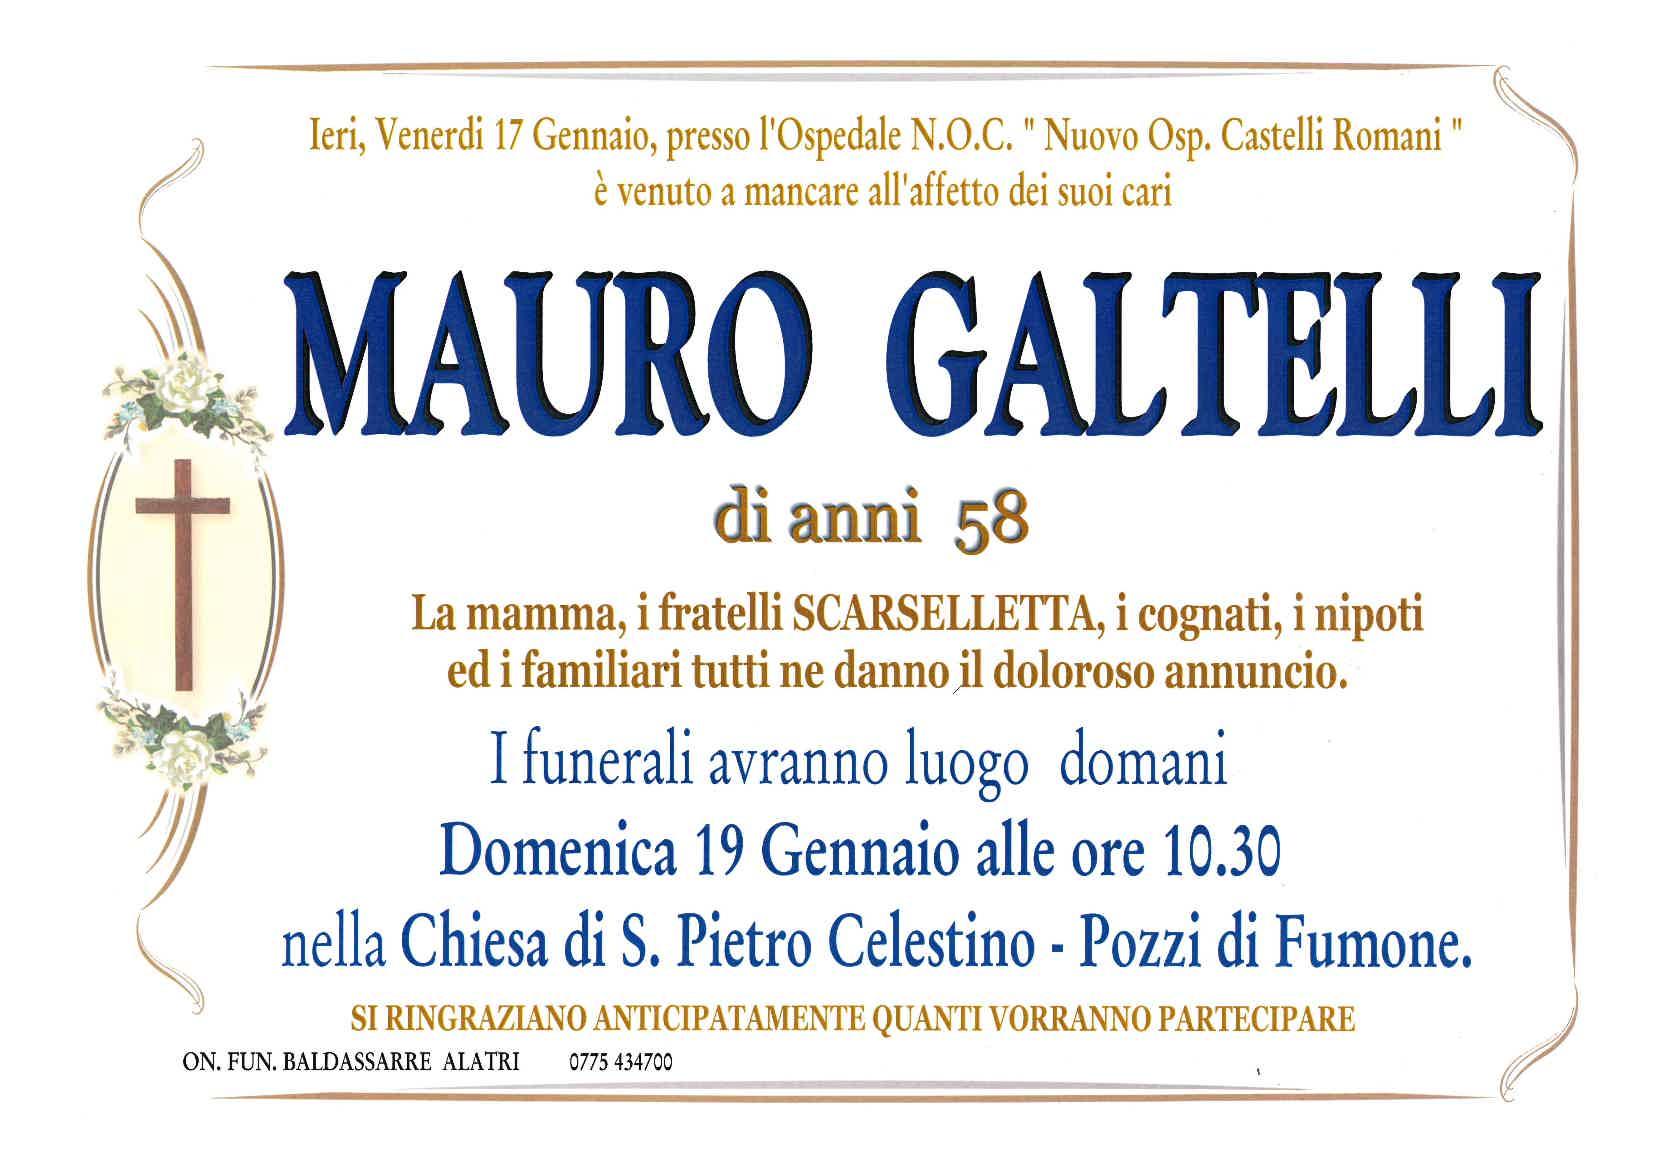 Mauro Galtelli